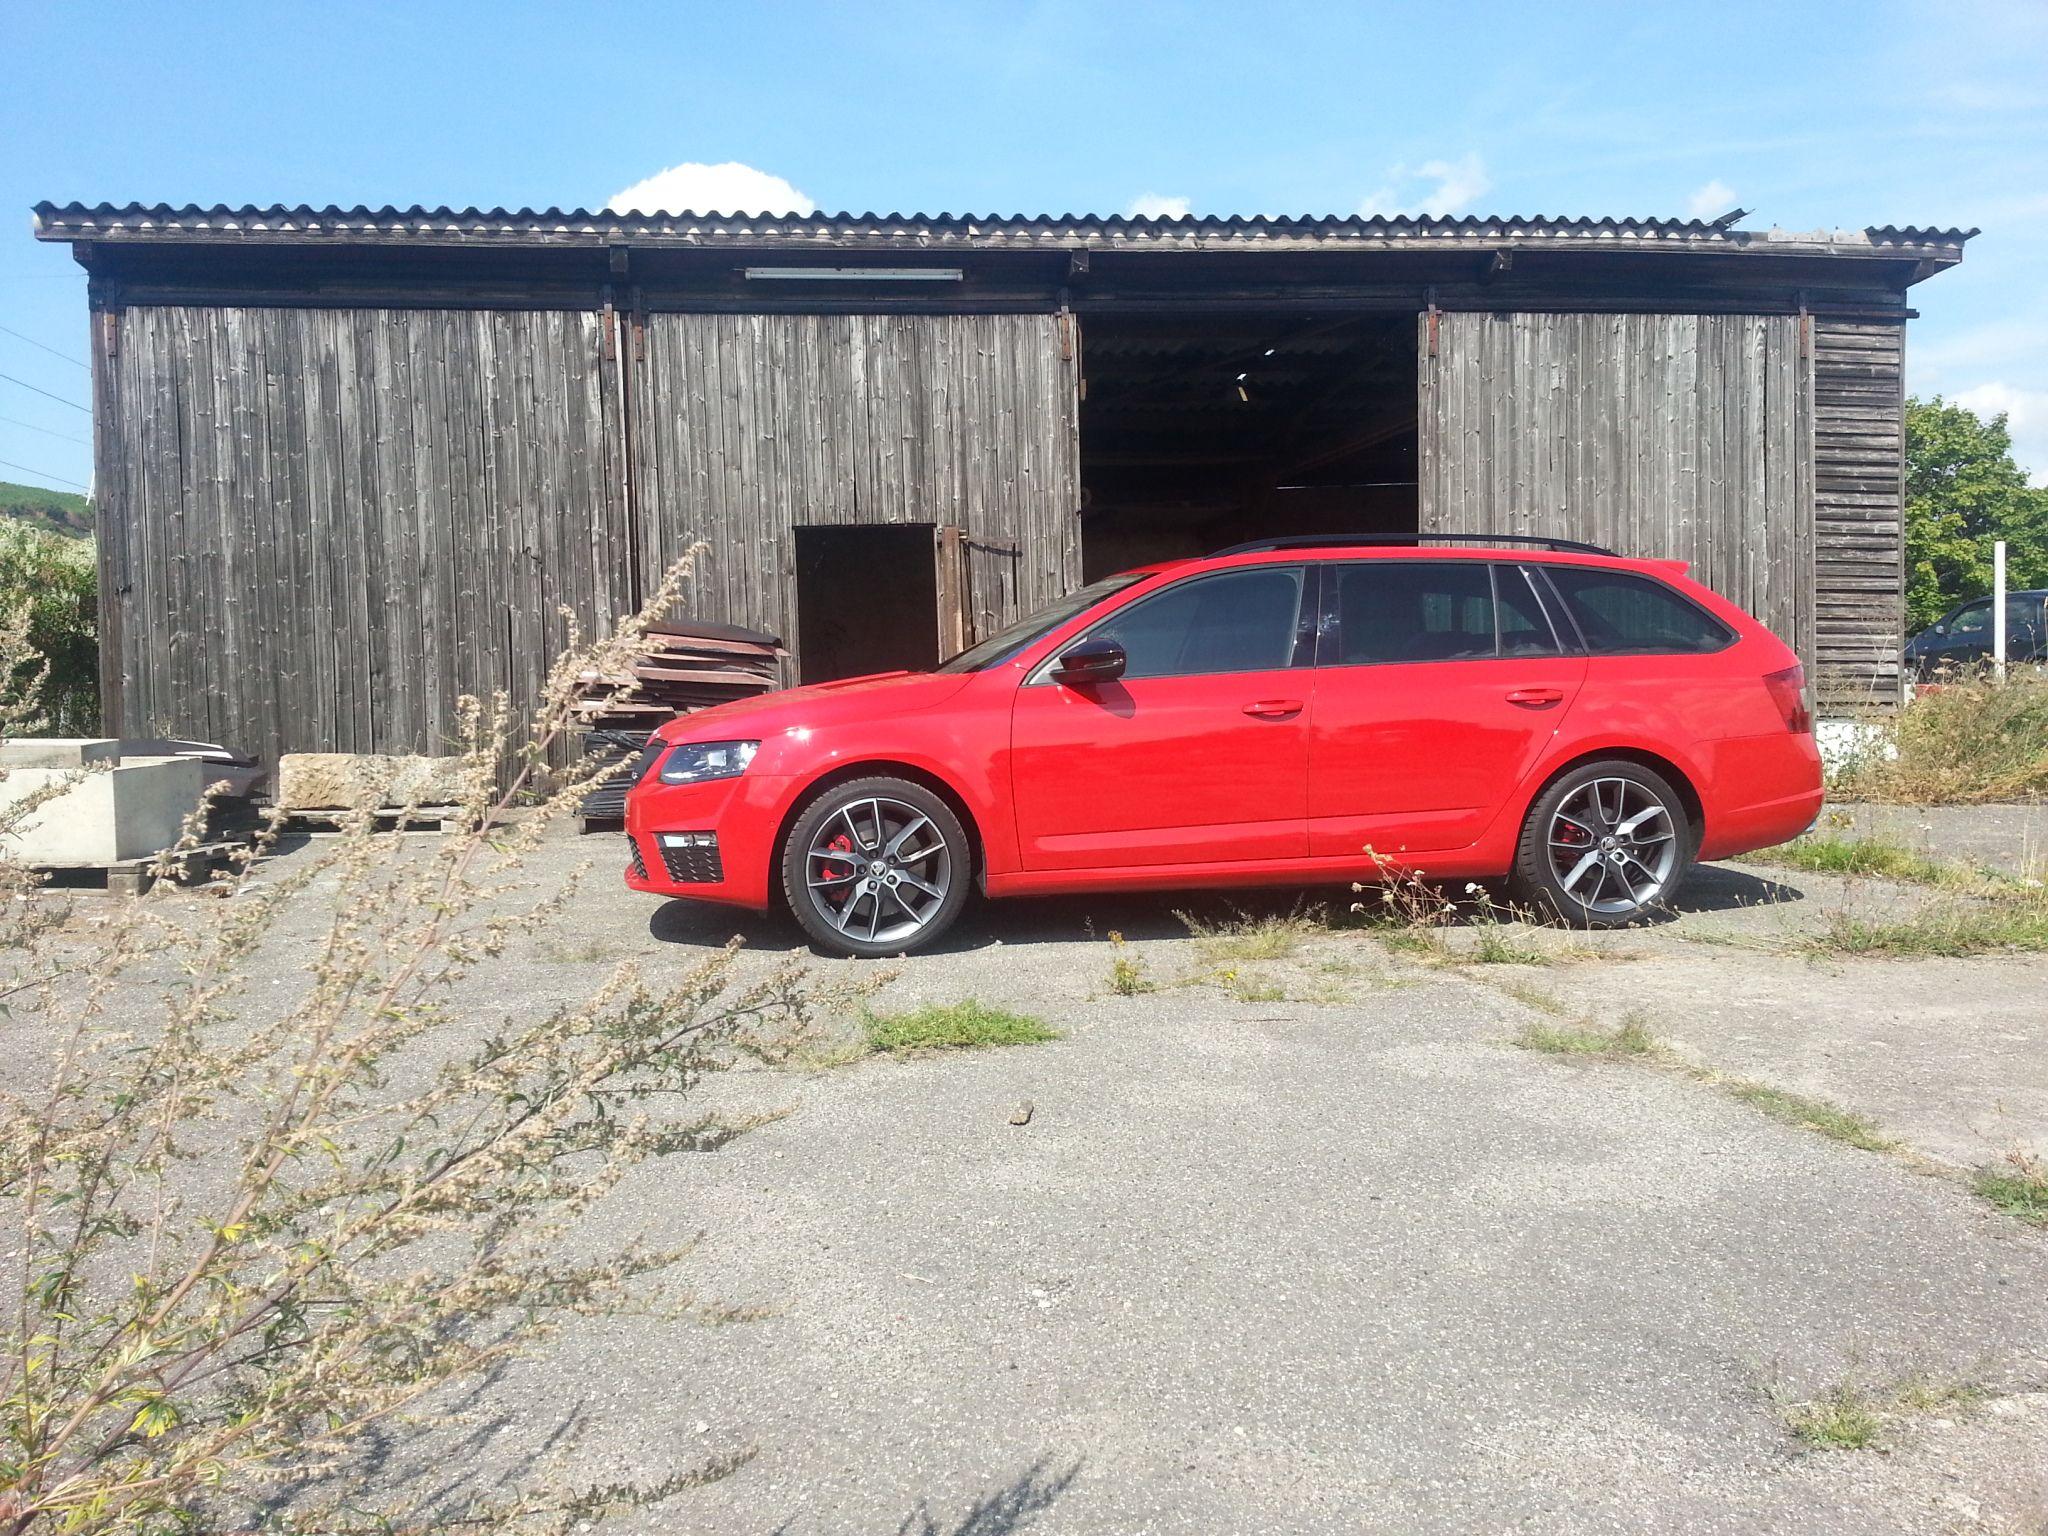 Familiencheck Mit Dem Škoda Octavia Rs Combi August